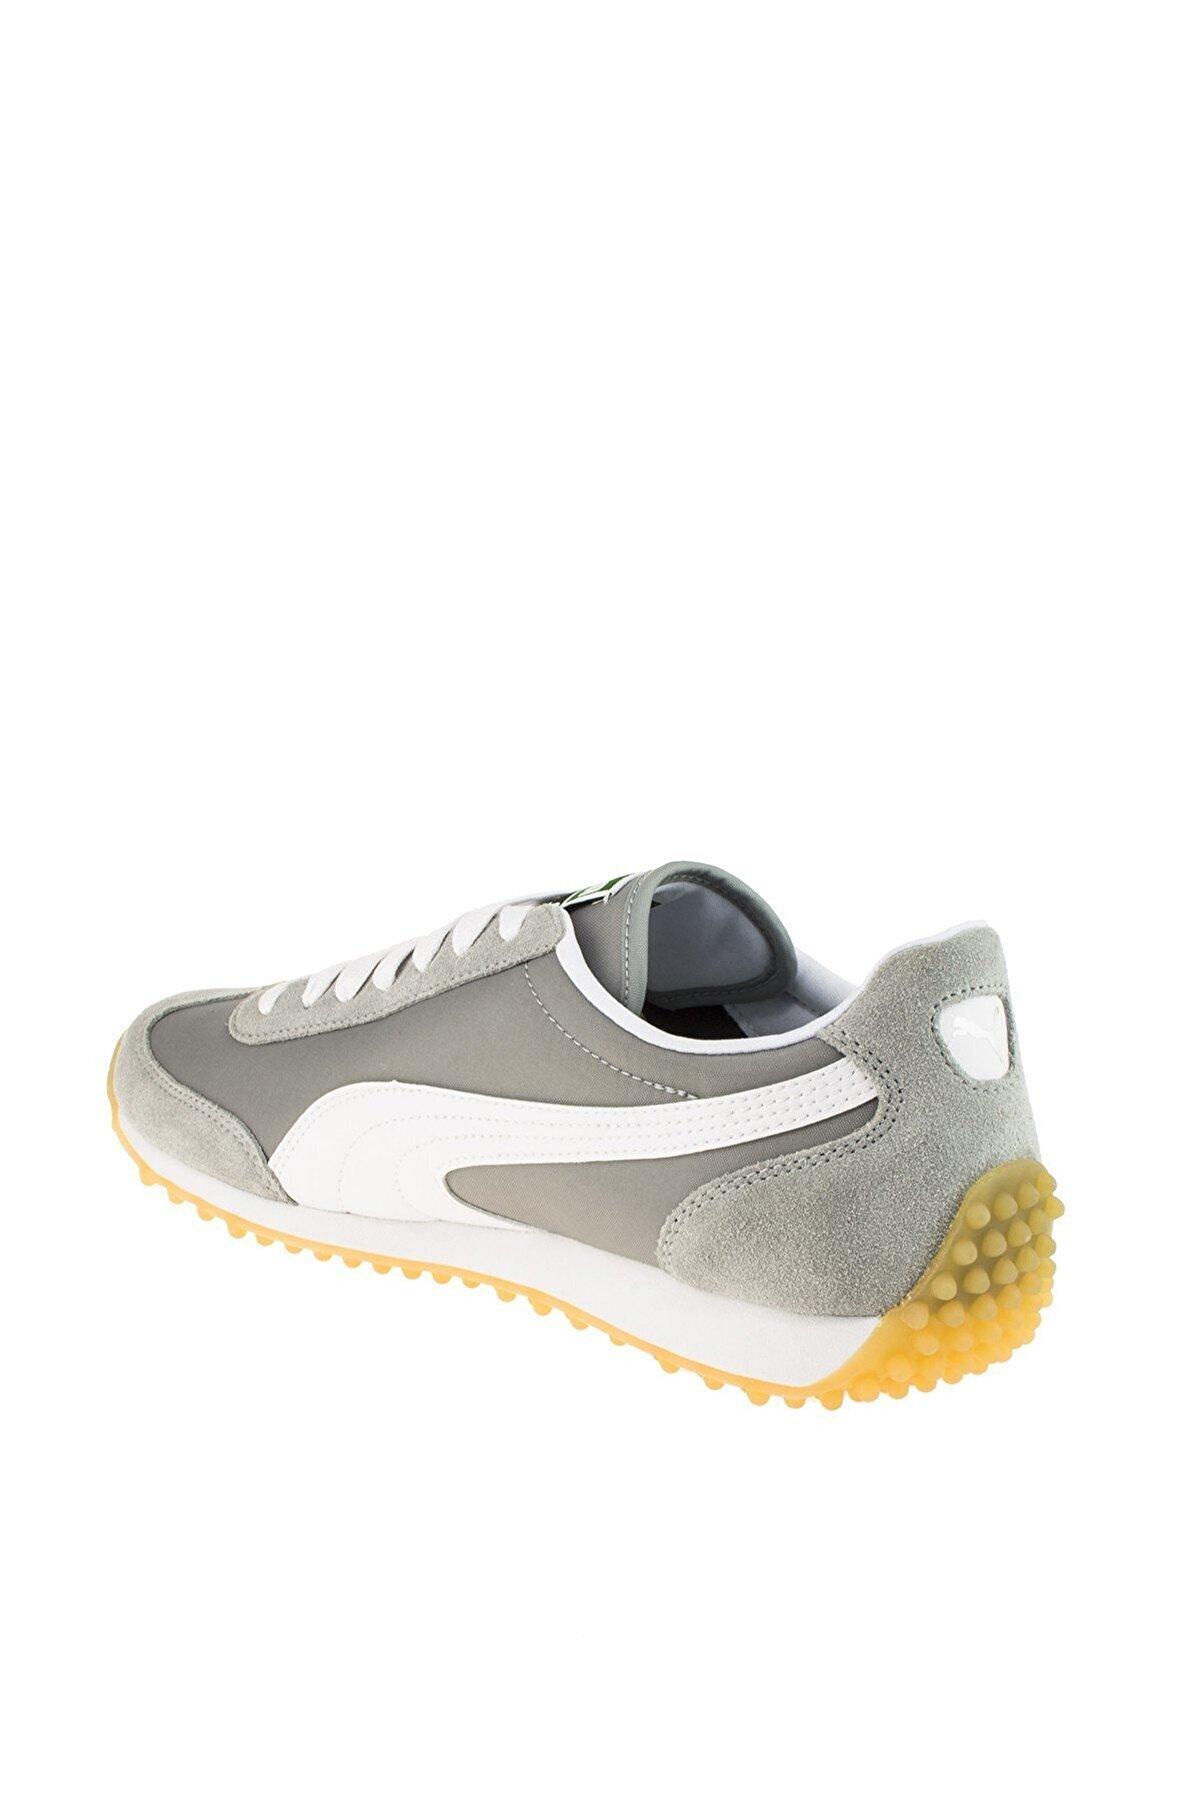 Puma WHIRLWIND CLASSIC Erkek Ayakkabı